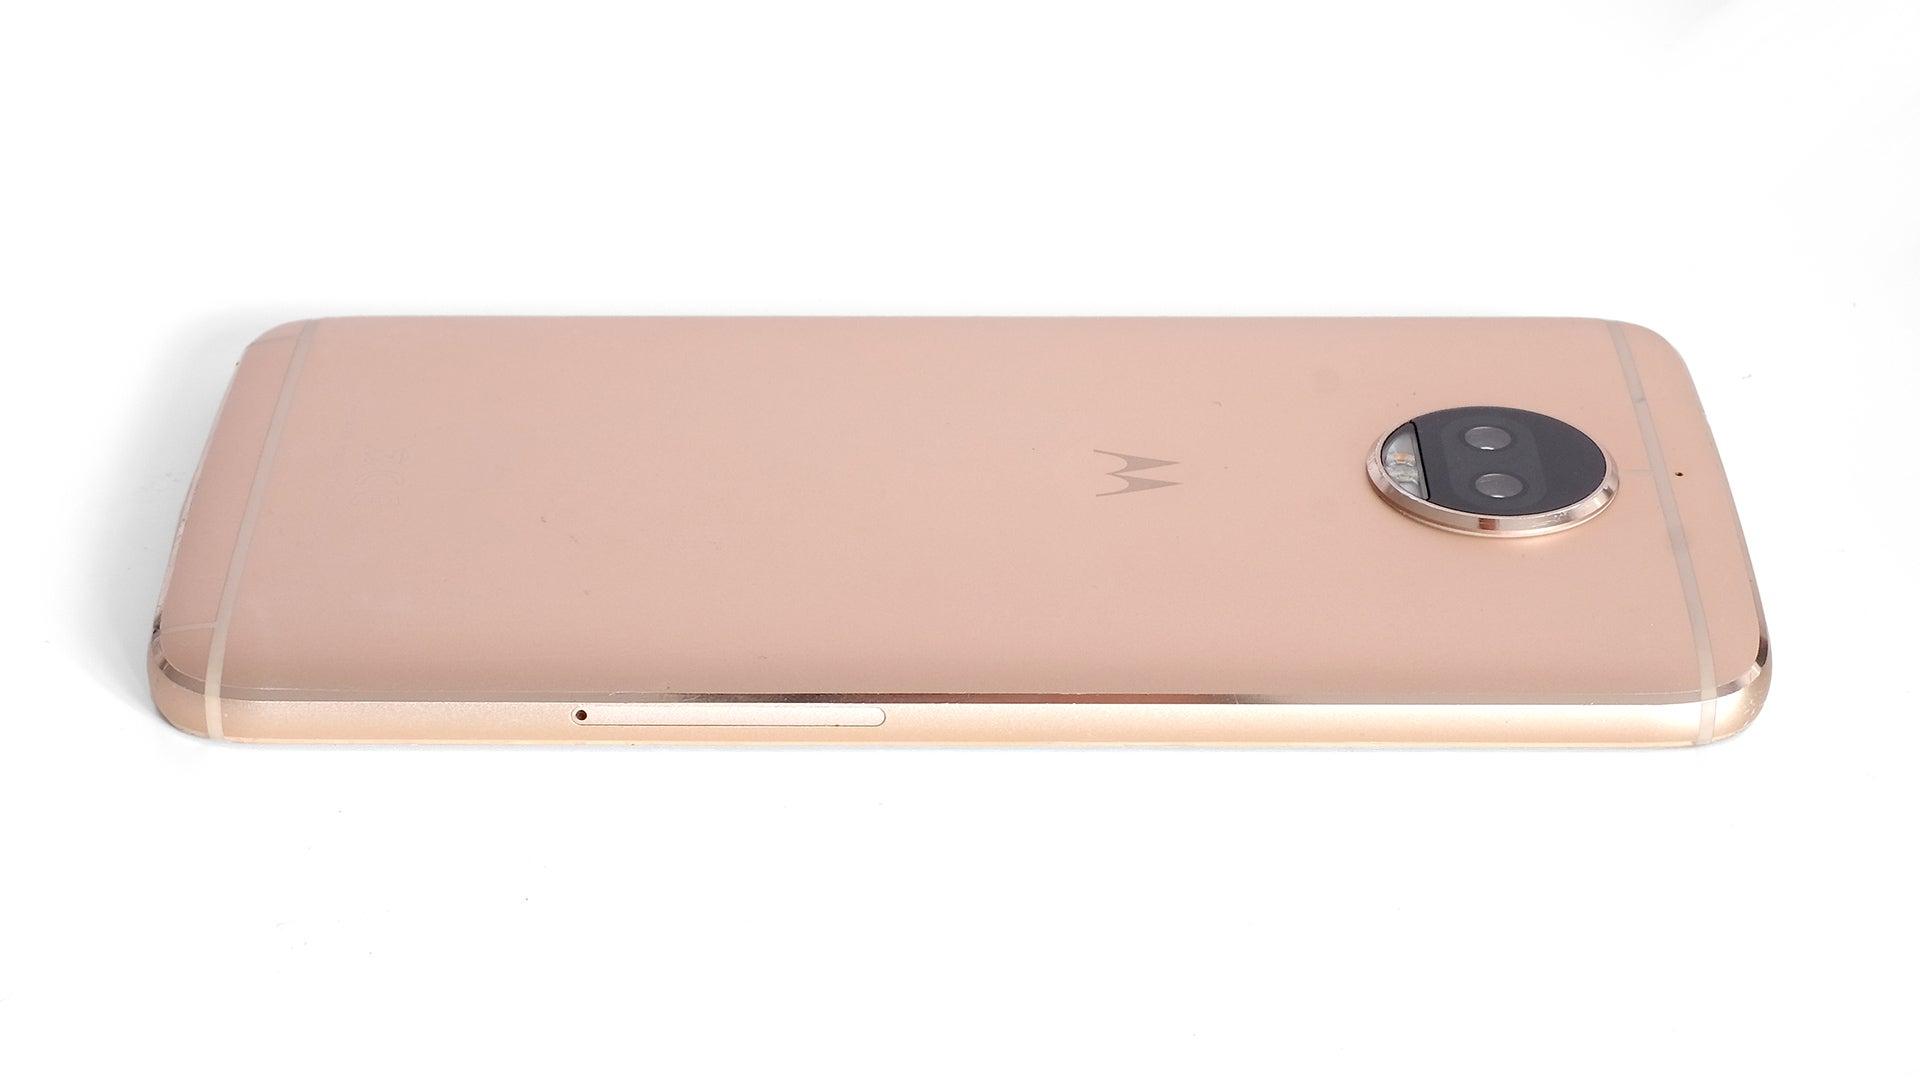 timeless design e8c8f 0d57c Moto G5S Plus Review   Trusted Reviews